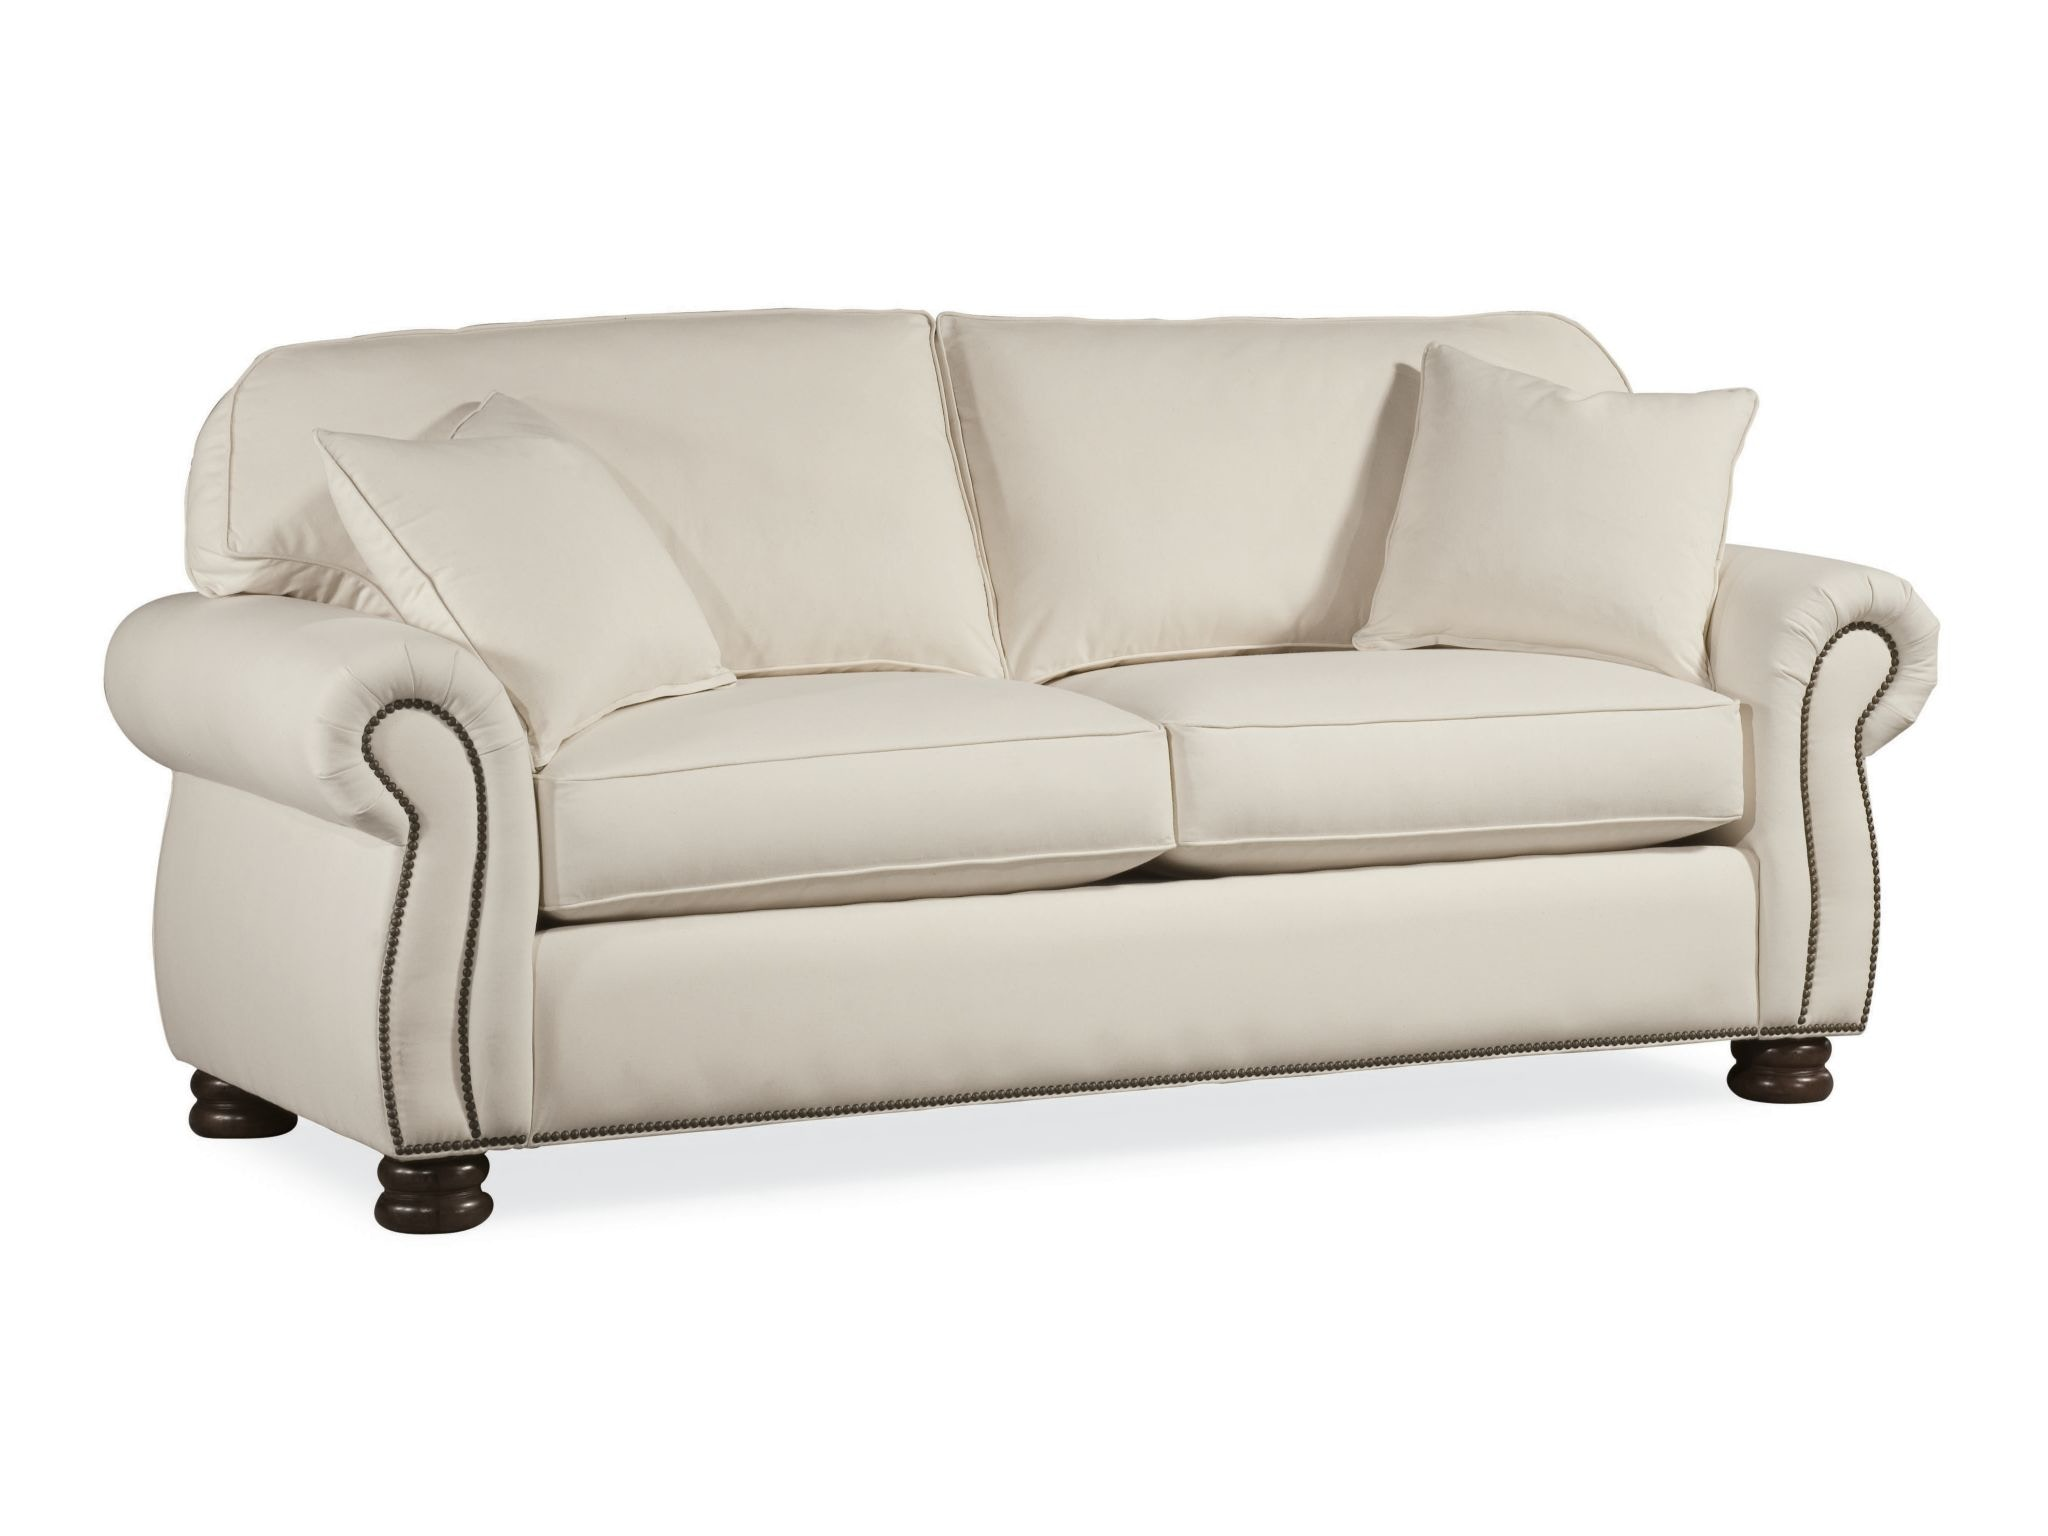 thomasville benjamin sofa set in bangalore quikr living room 2 seat 1461 11